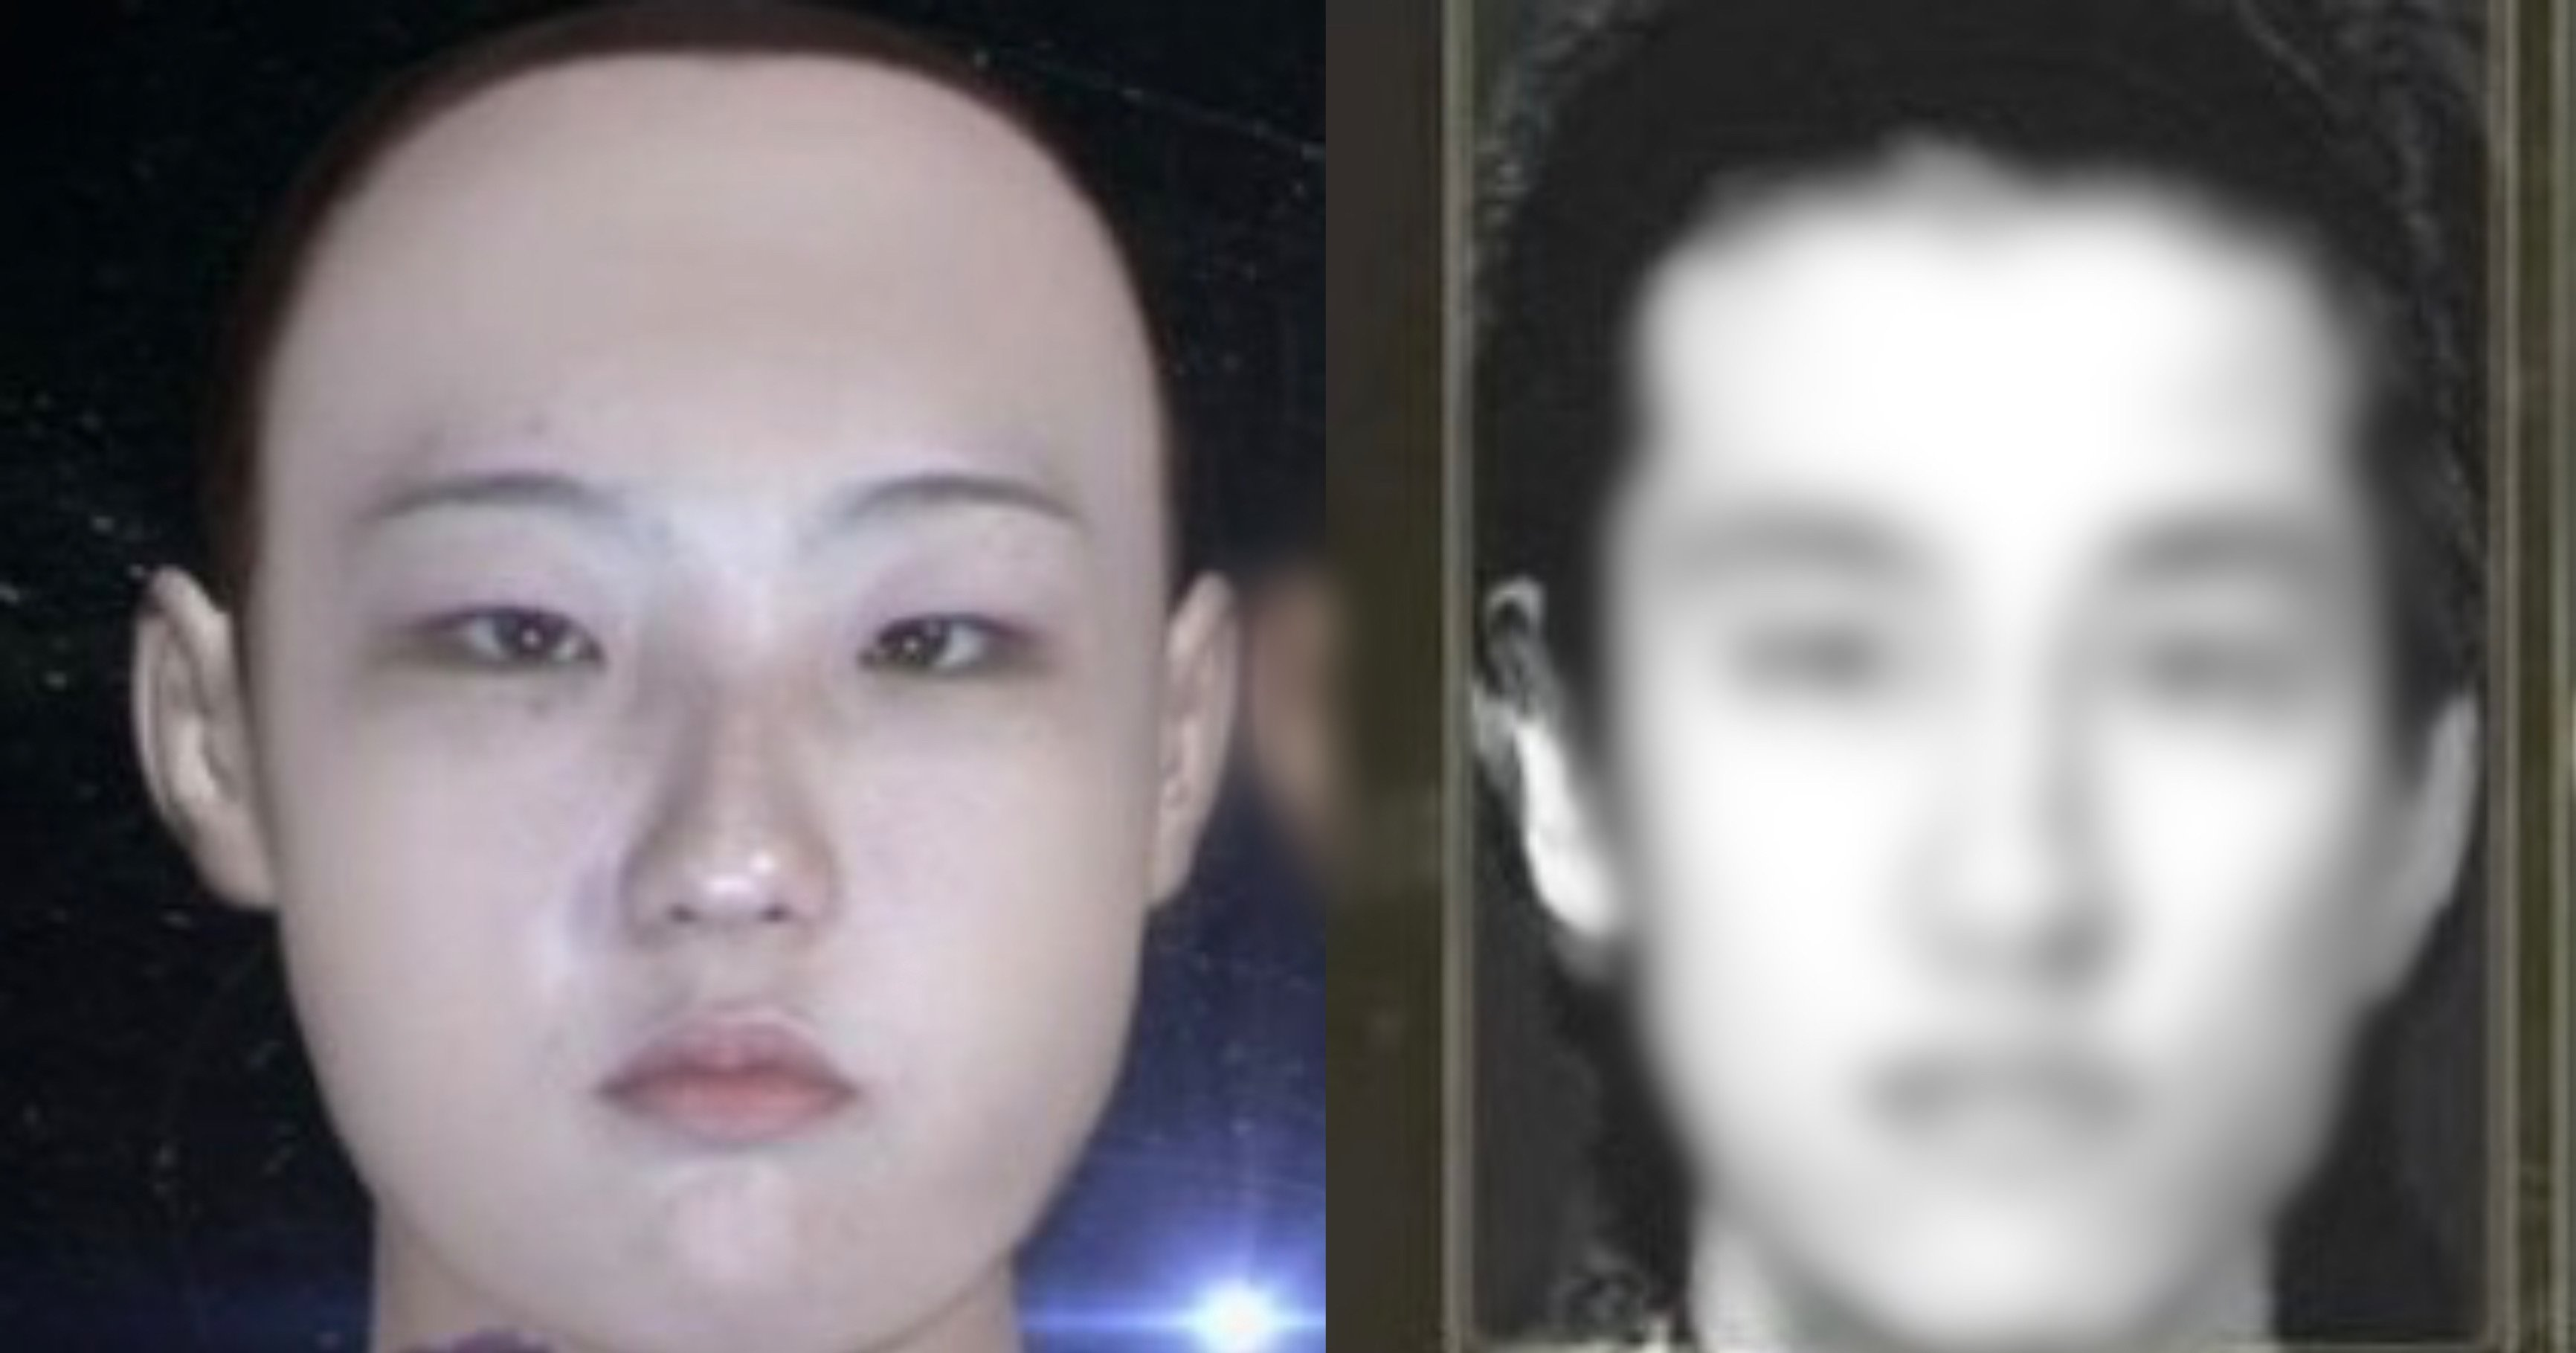 "a7086b68 40ce 479c bcca 53adb7fdca56.jpeg?resize=1200,630 - ""이게 대한민국 평균 얼굴이라고? 난 평균 이상인듯""…20년 동안 분석한 한국 남녀의 '평균 얼굴'"